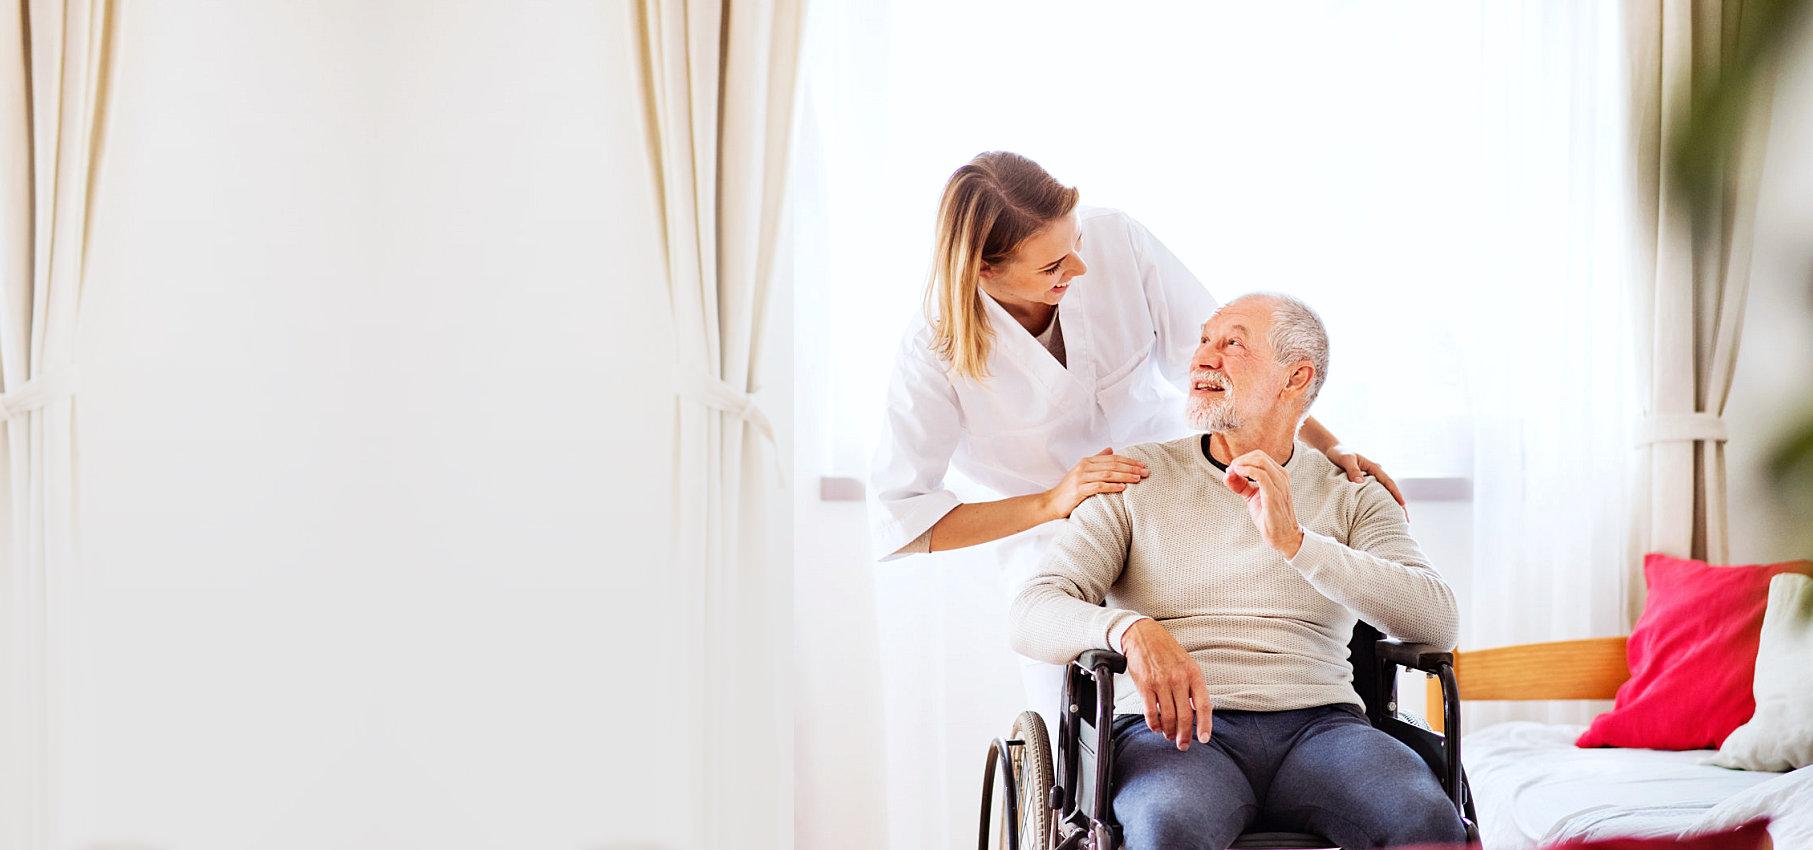 caregiver taking care of her elderly patient